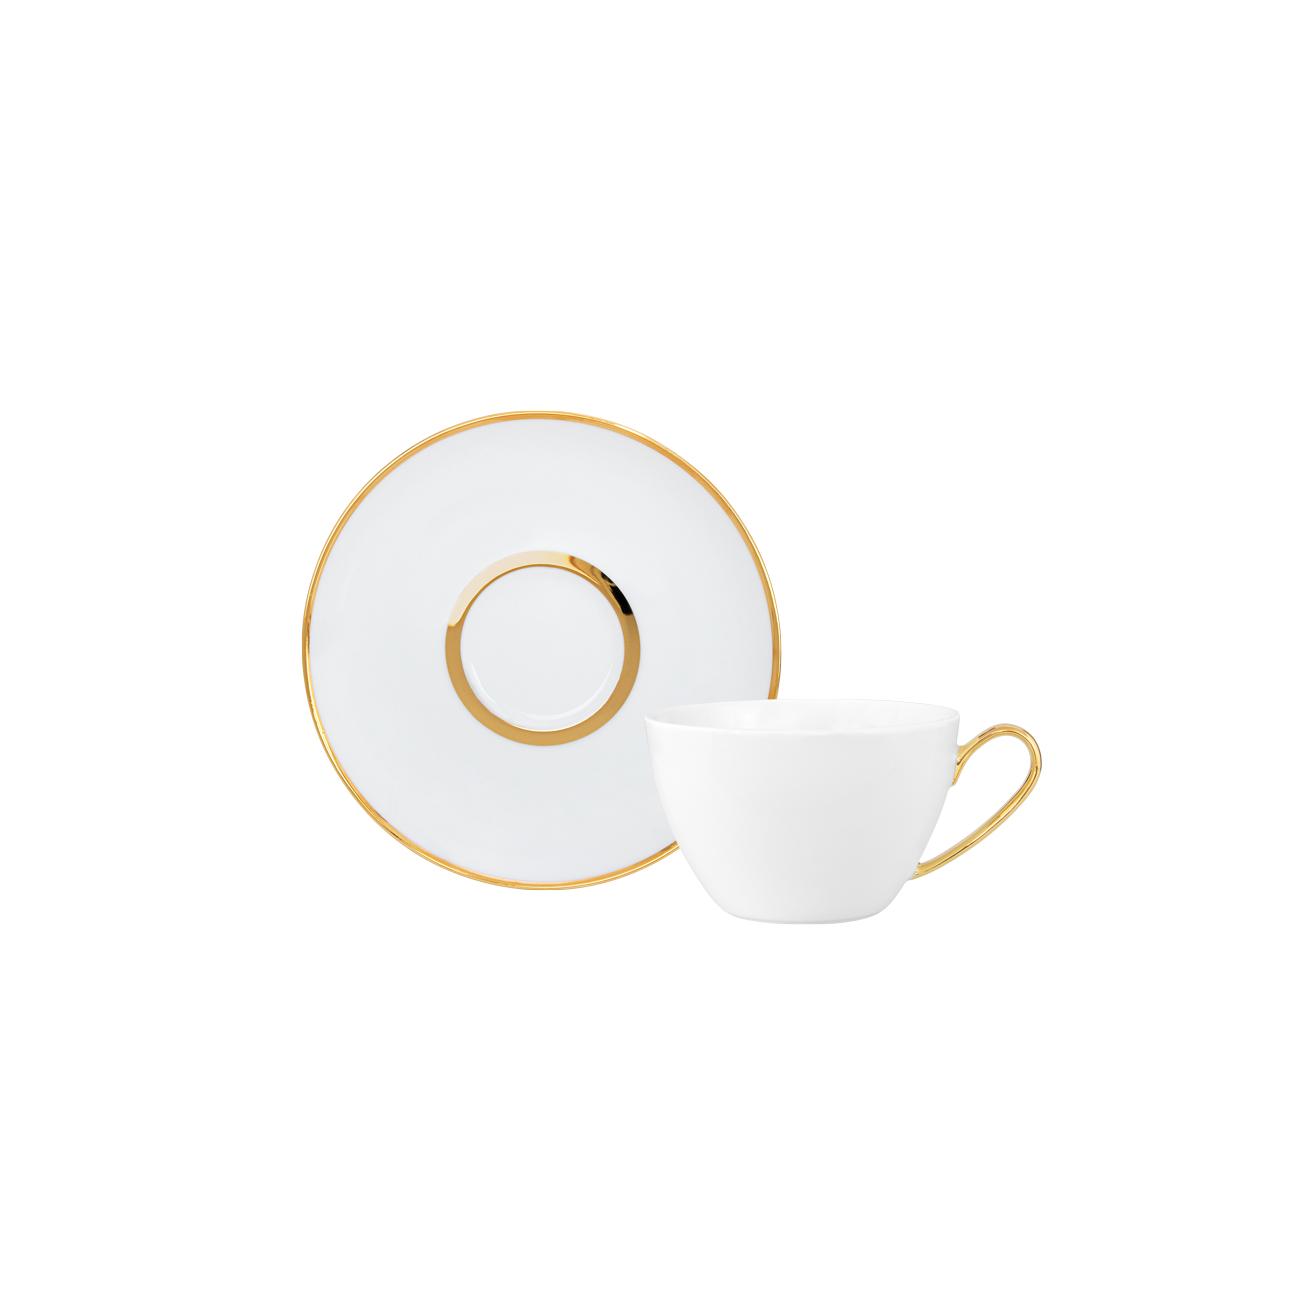 Pires Chá 15cm Olympus + Chávena Chá 23cl NC 0